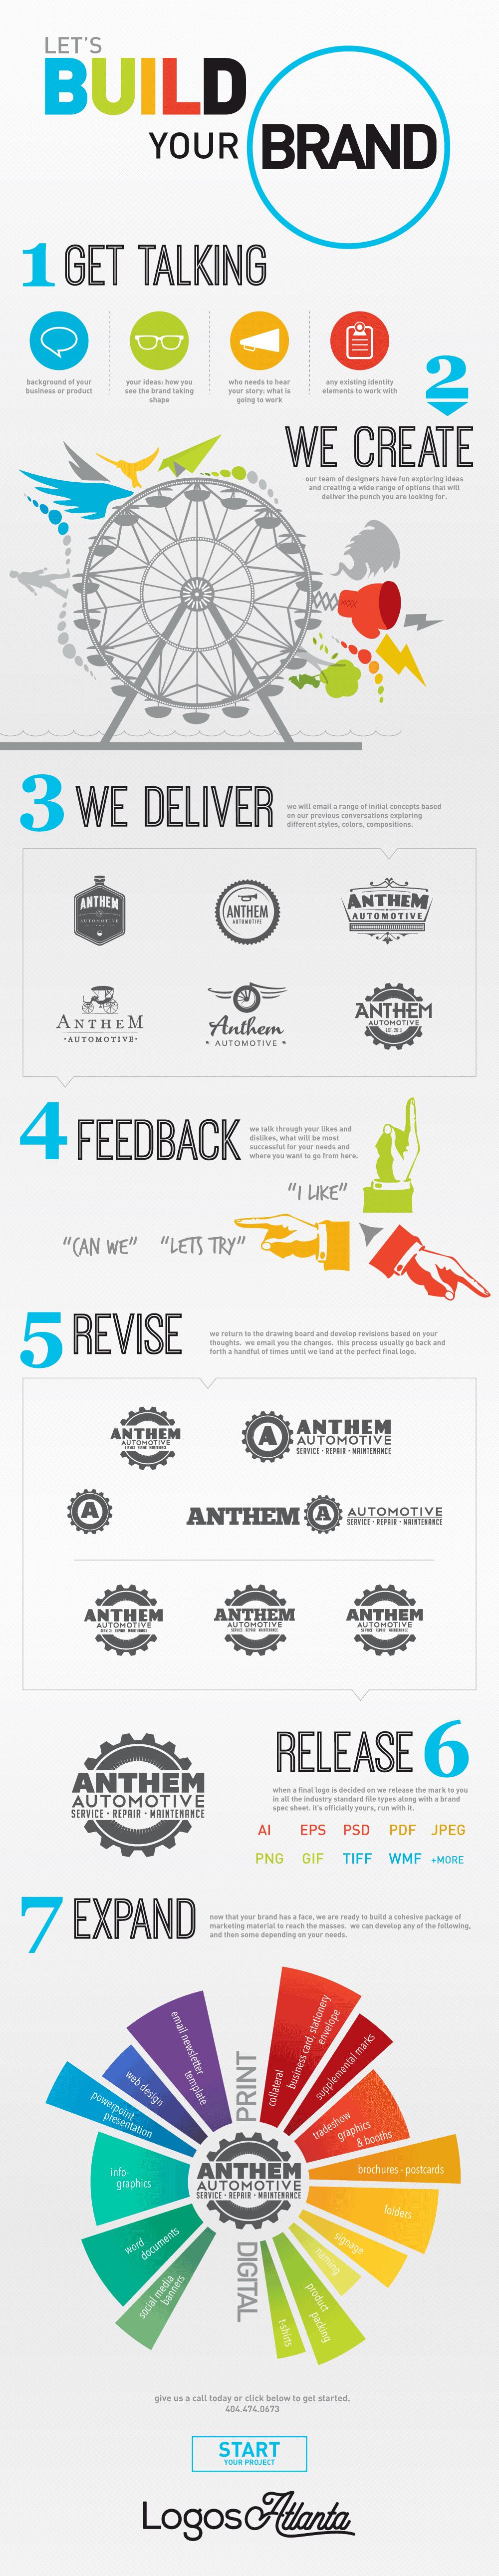 logos-atlanta-infographic.png